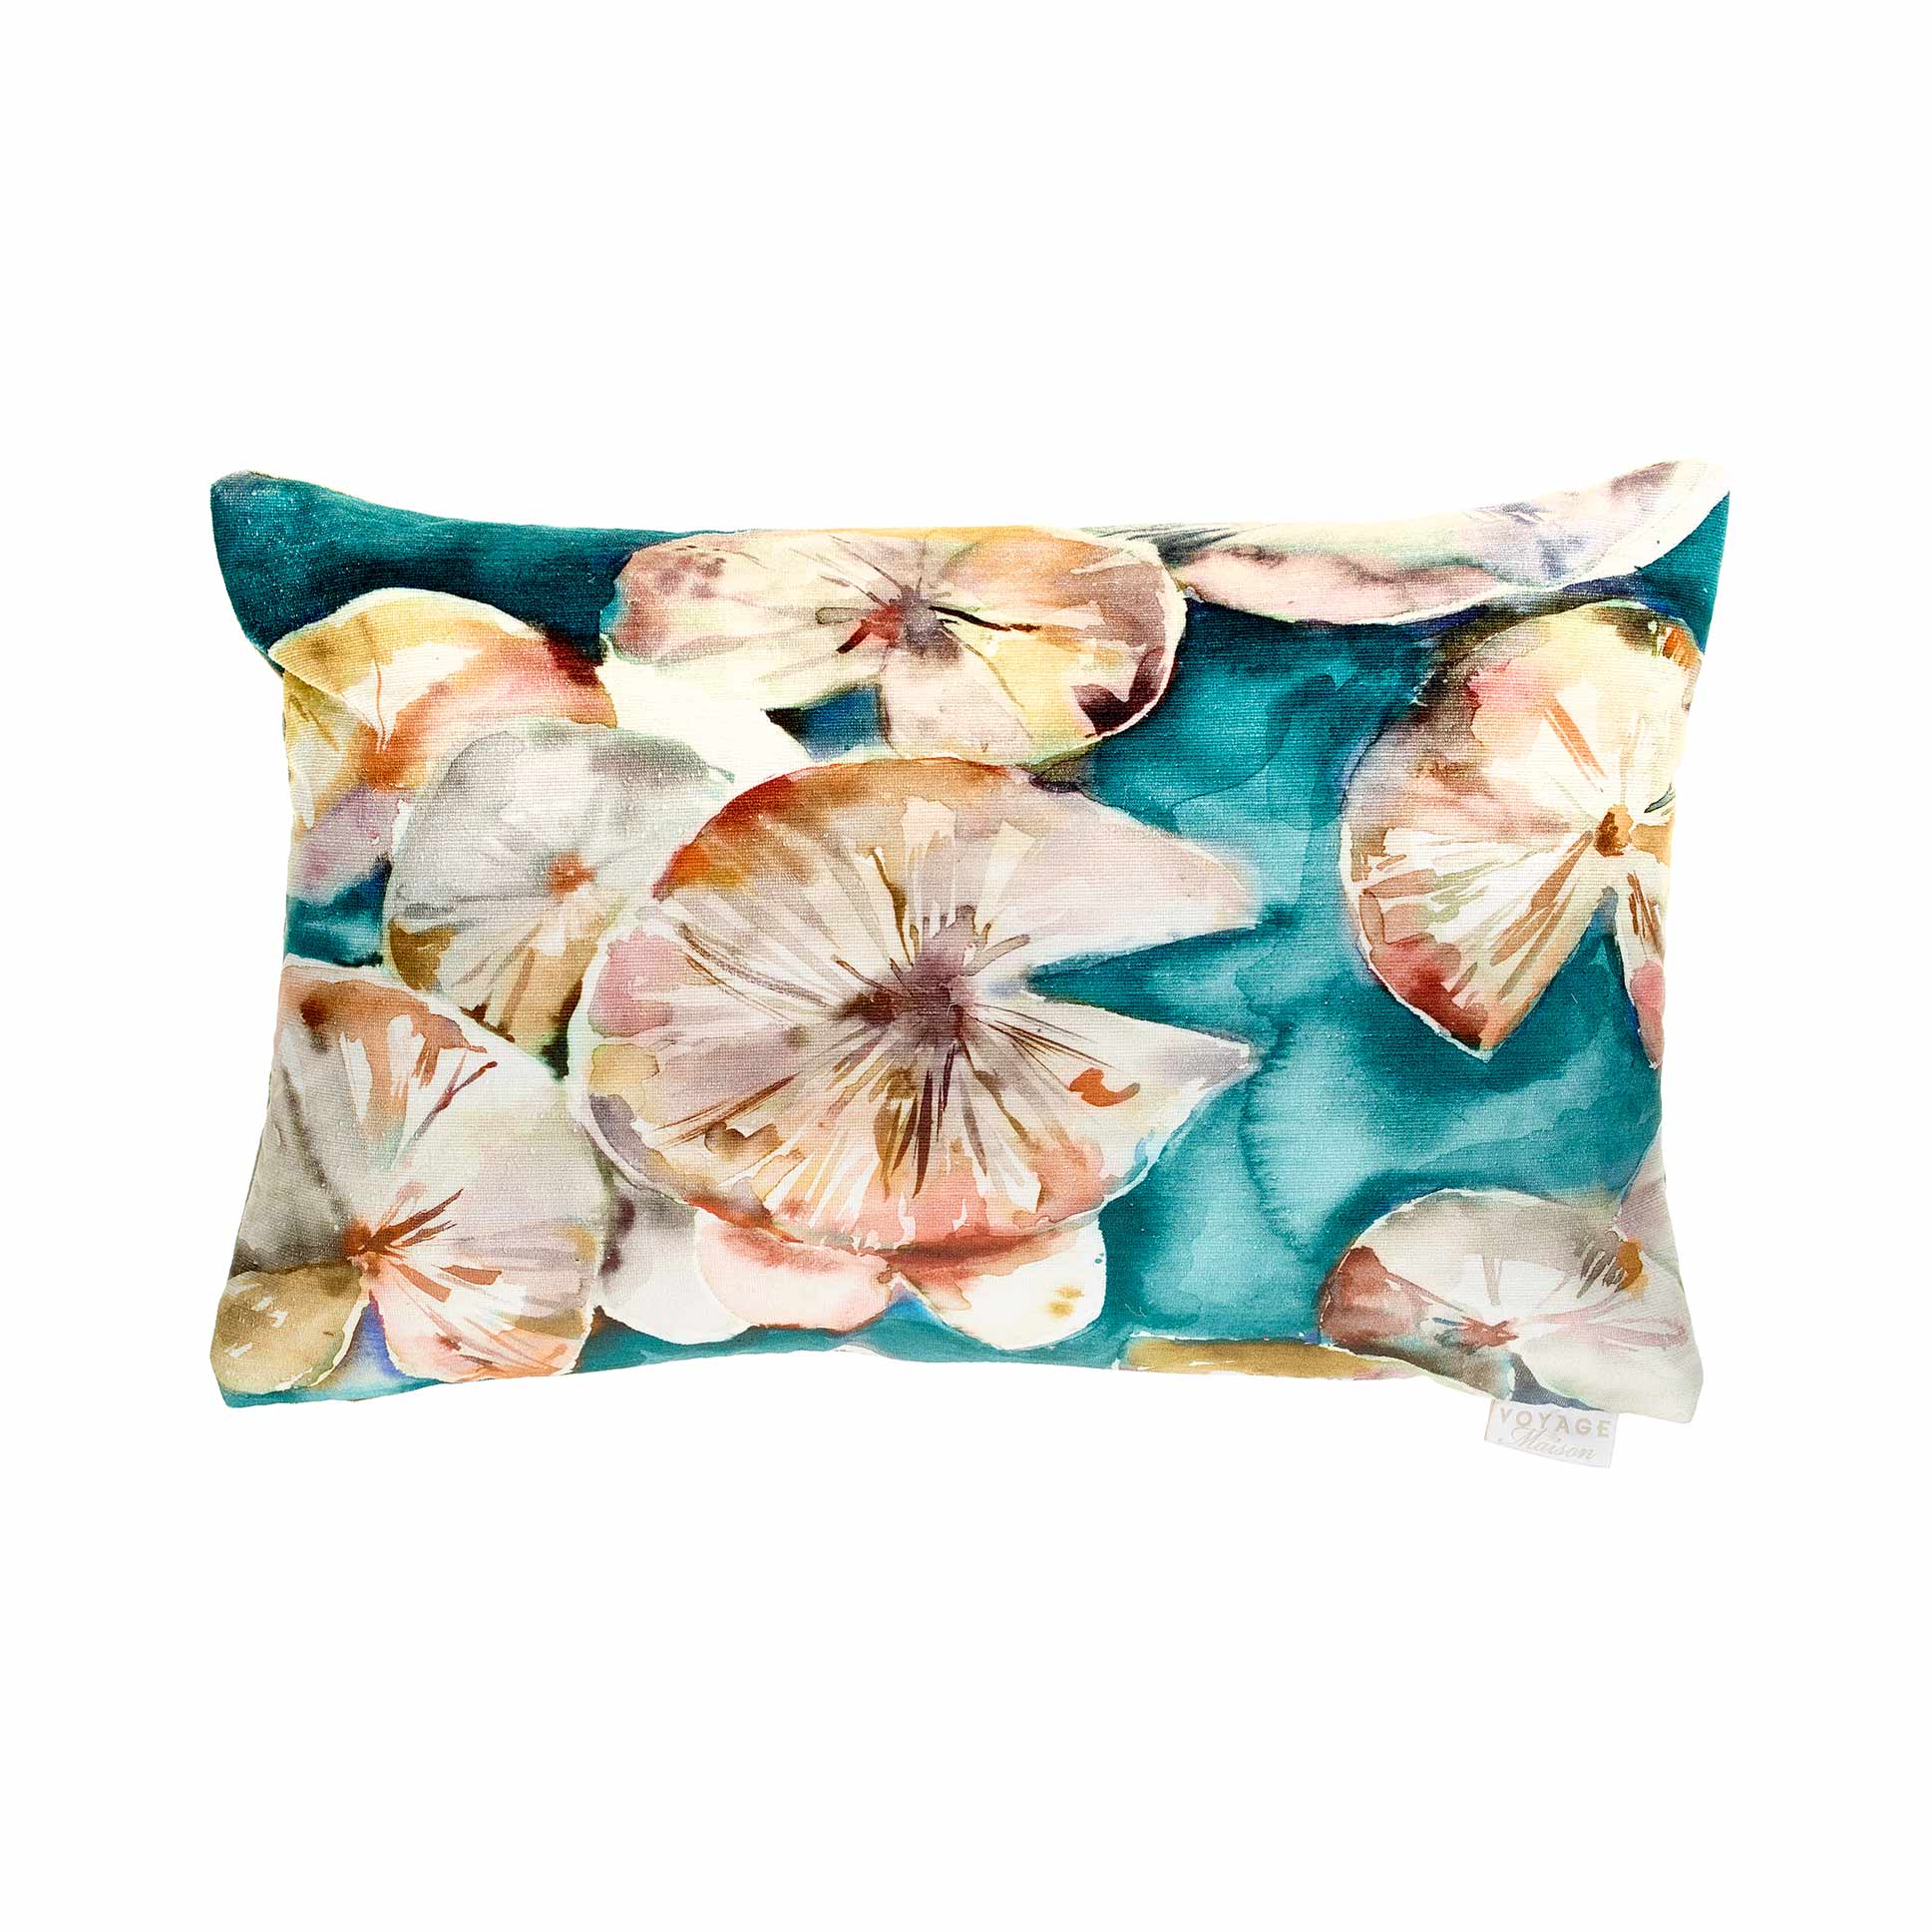 Lily Pad Amber (Emerald) Velvet Cushion 40x60cm